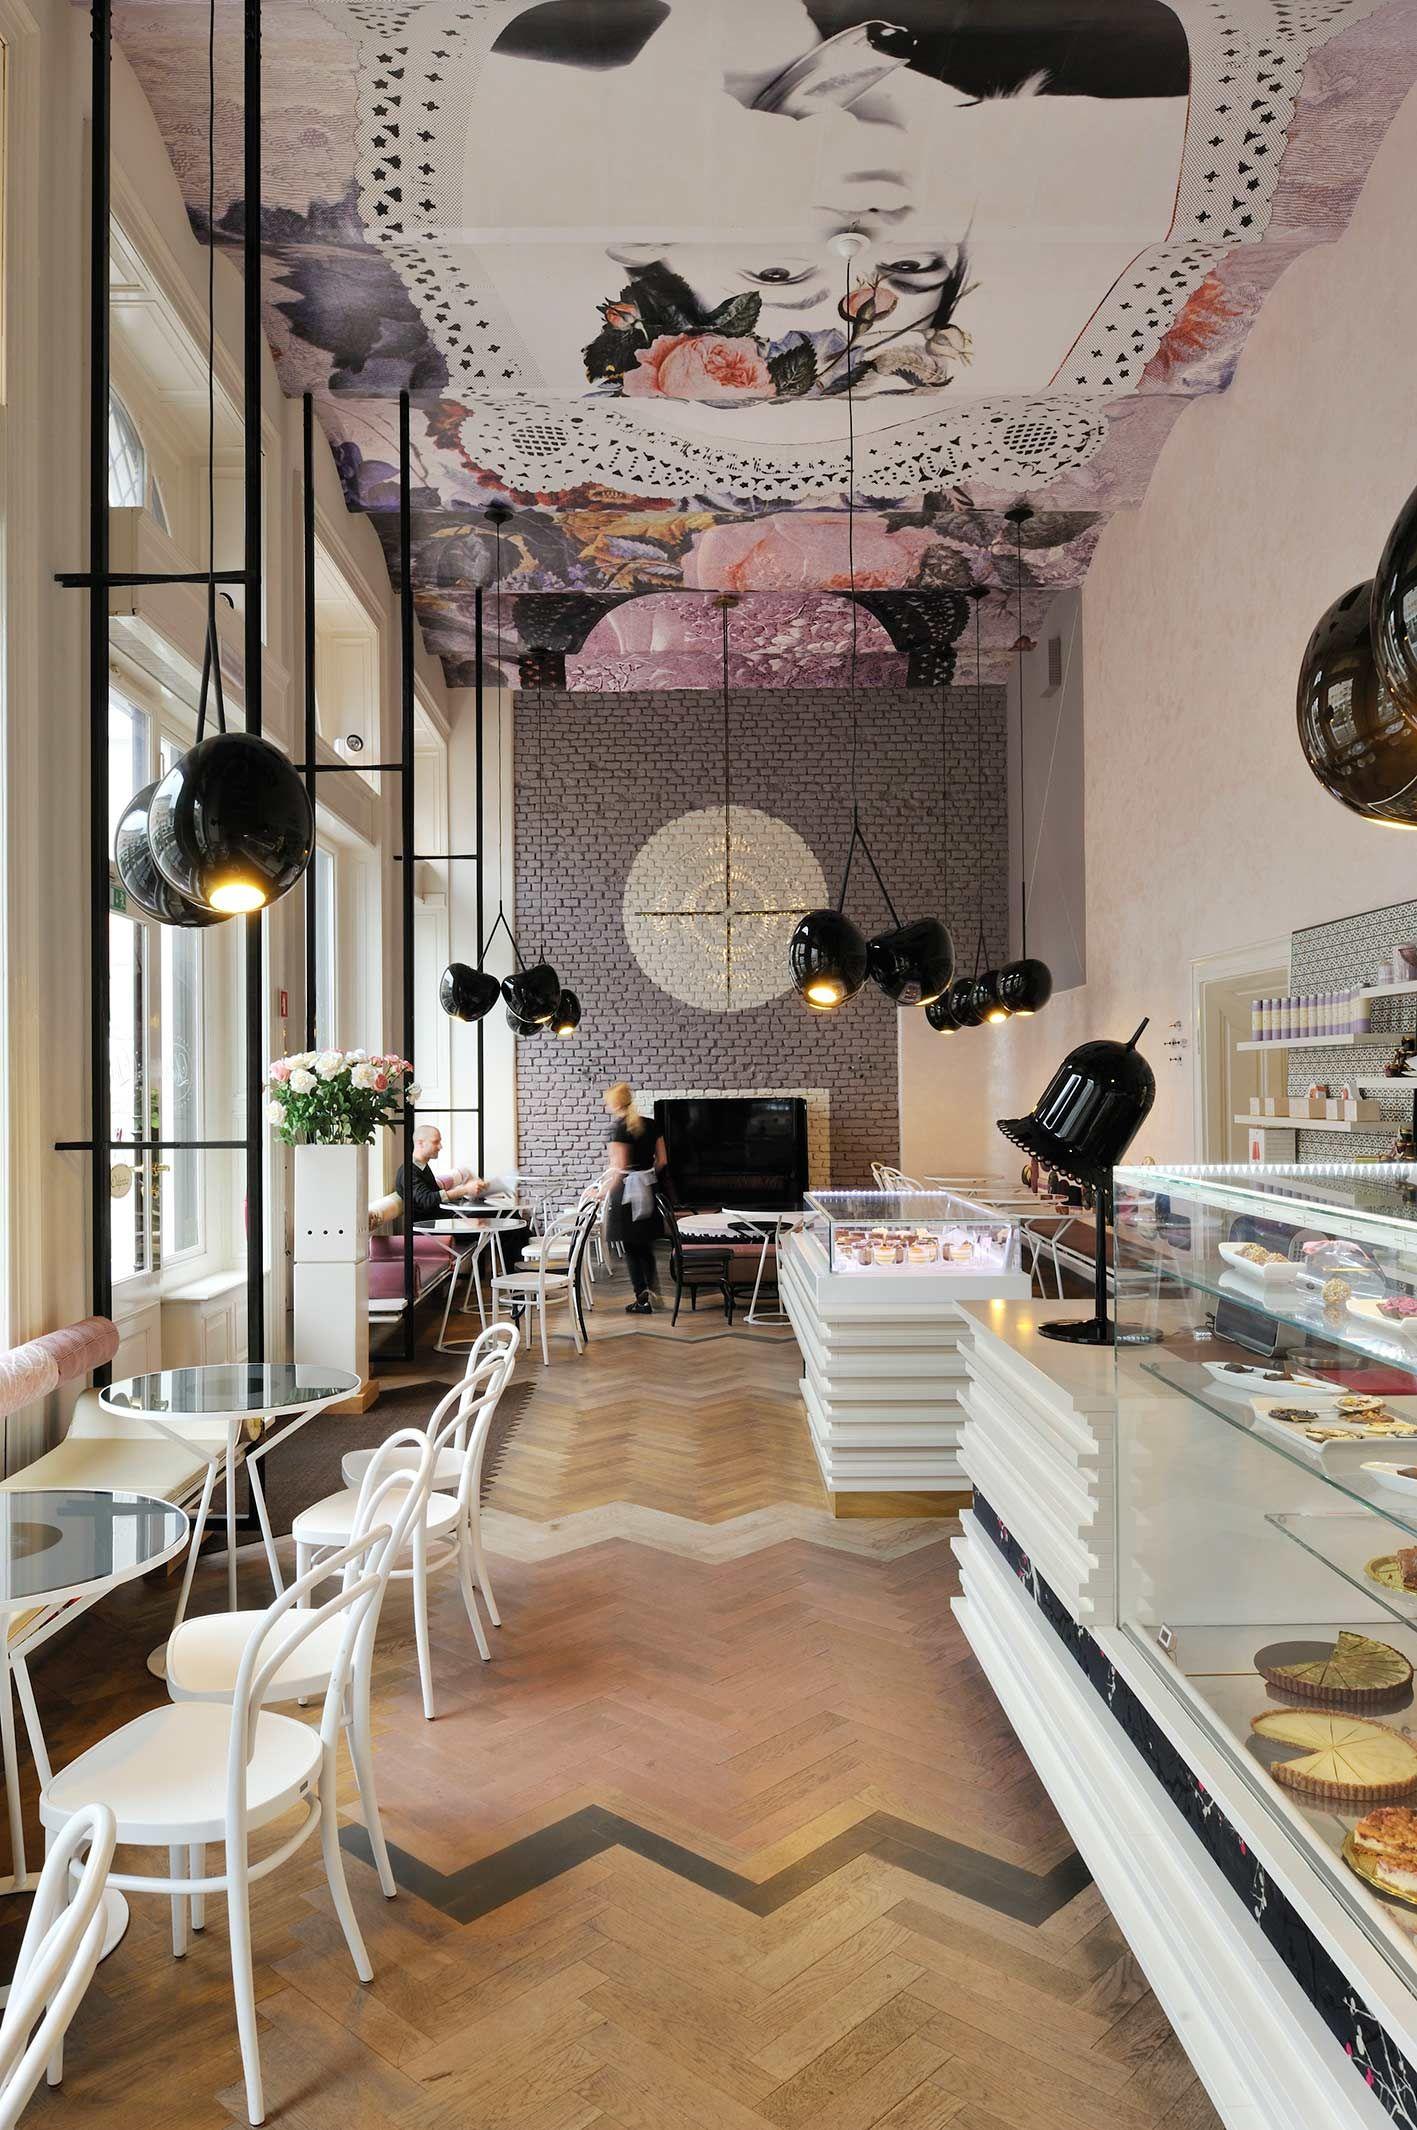 Great ceilings at The Lolita Café Ljubiljana   summer lovin ...